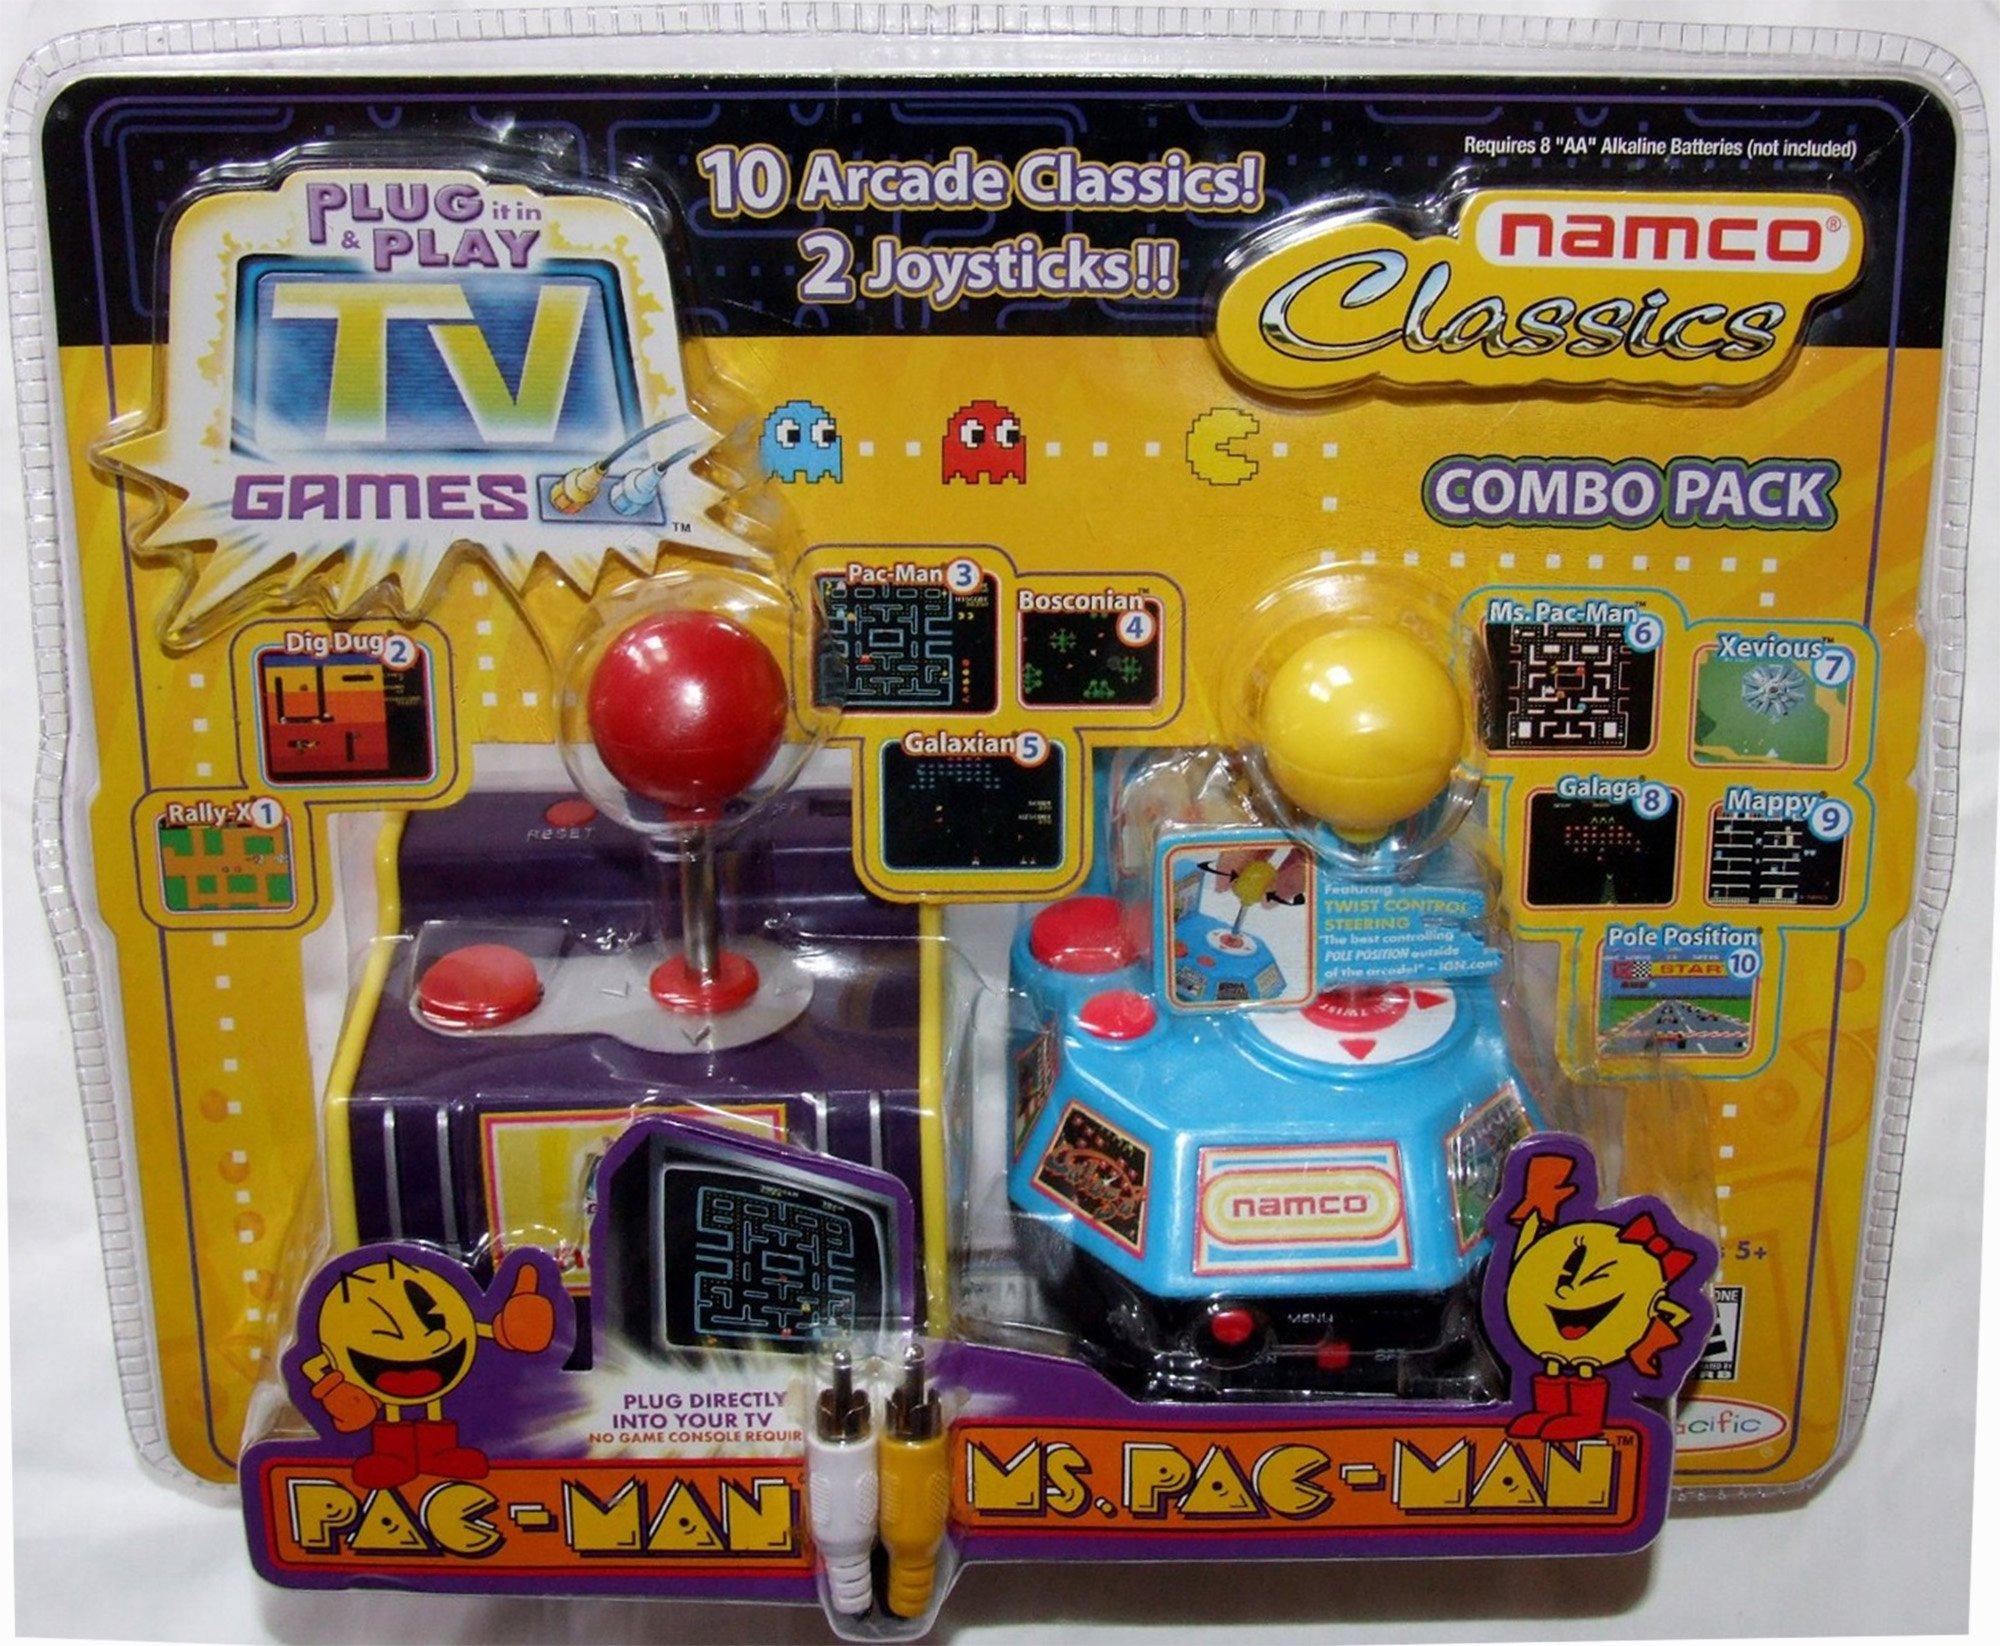 Jakks Plug & Play TV Games Namco Classics Combo Pack: Pac-Man & Ms. Pac-Man, 10 Arcade Classics